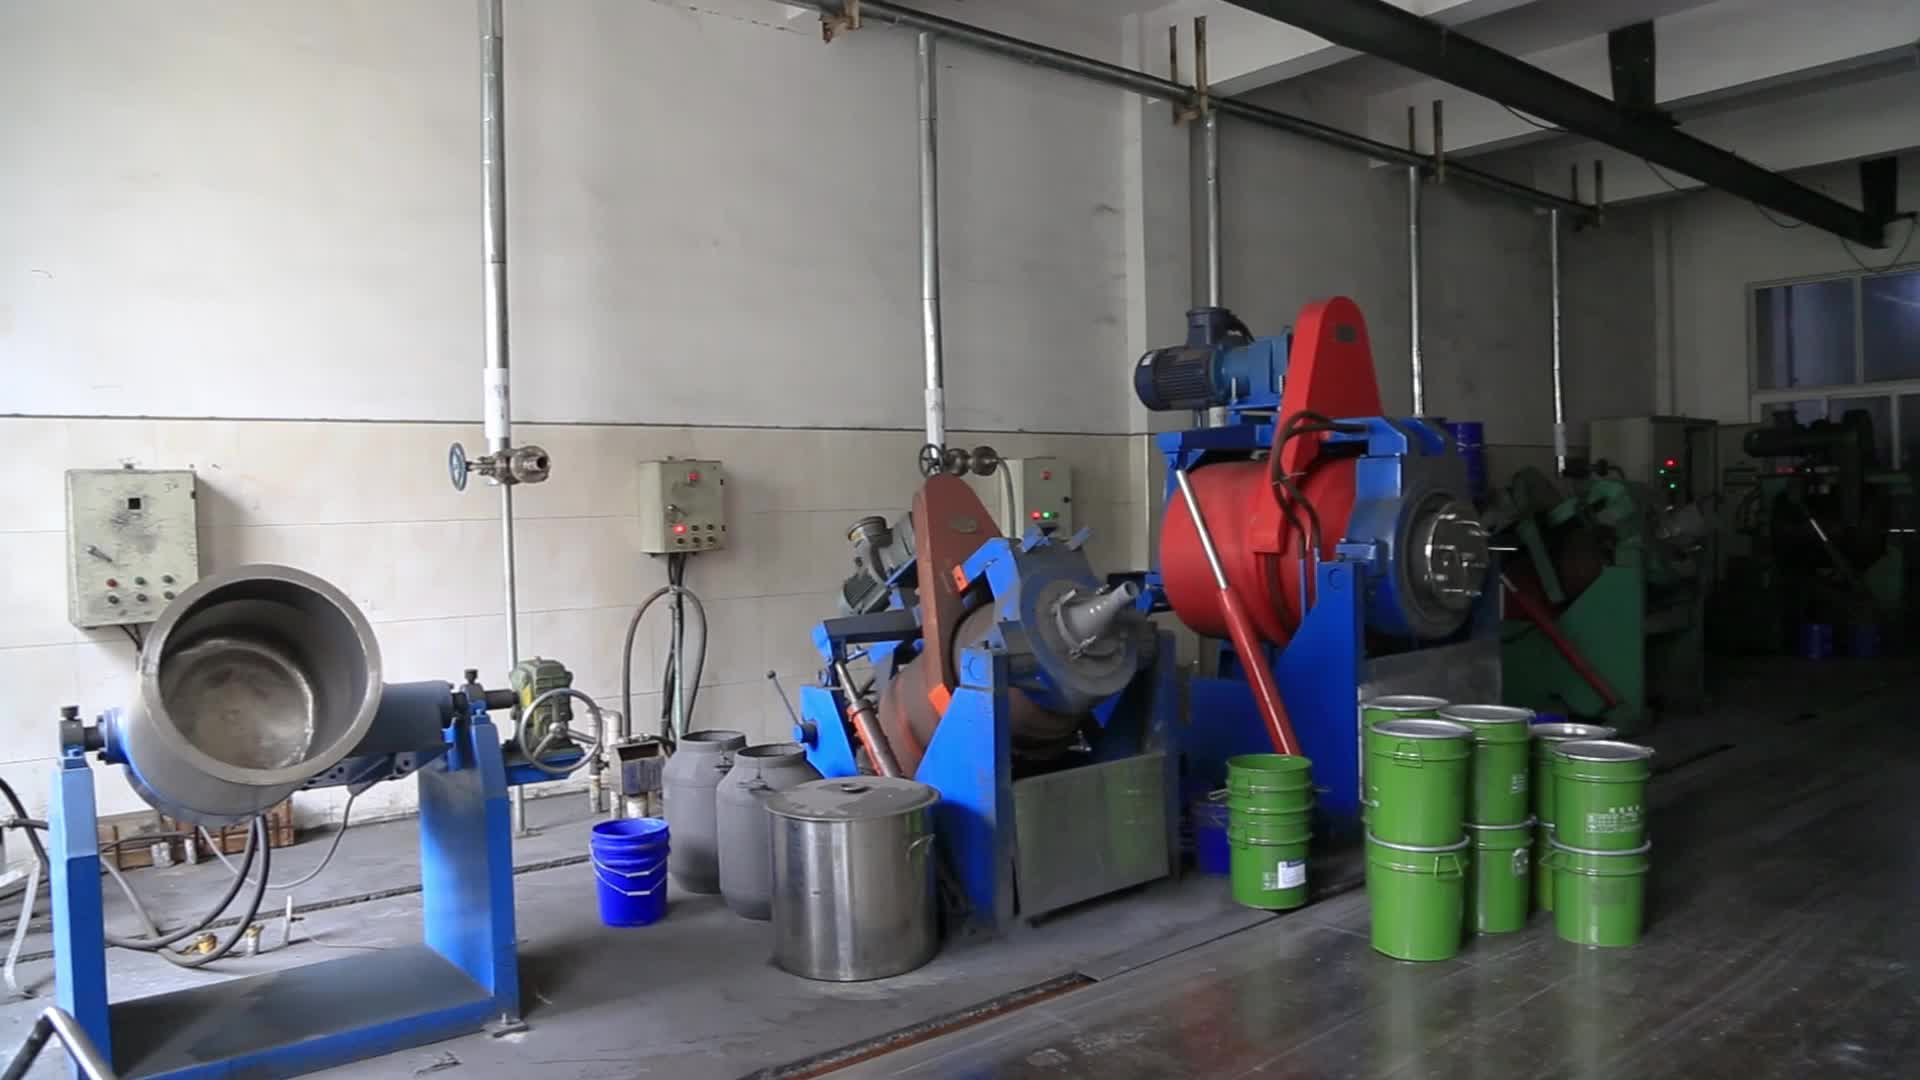 आपूर्ति अच्छी कीमत उच्च घर्षण प्रतिरोध स्टेनलेस स्टील धुंध फाउंटेन स्प्रे कम रखरखाव के लिए पुख्ता कार्बाइड नोक